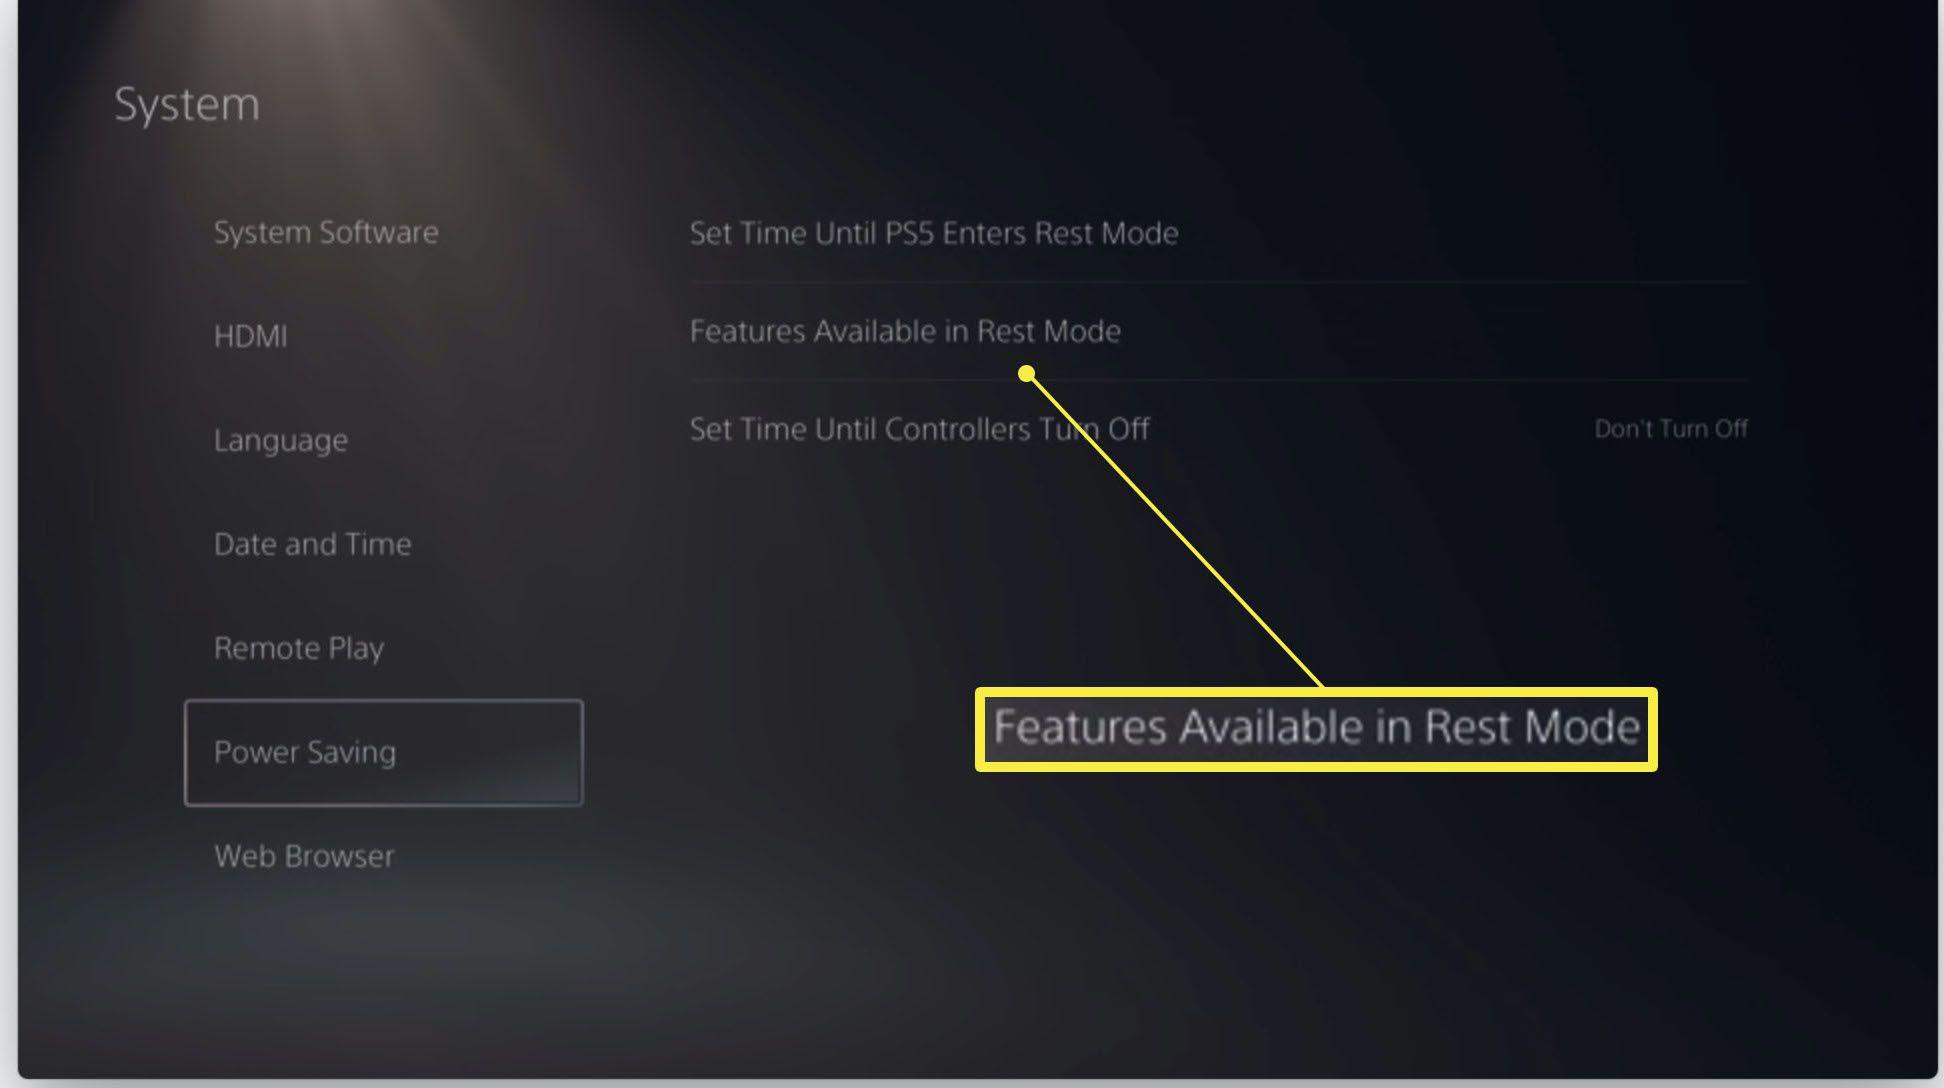 PlayStation 5 Power Saving settings highlighted